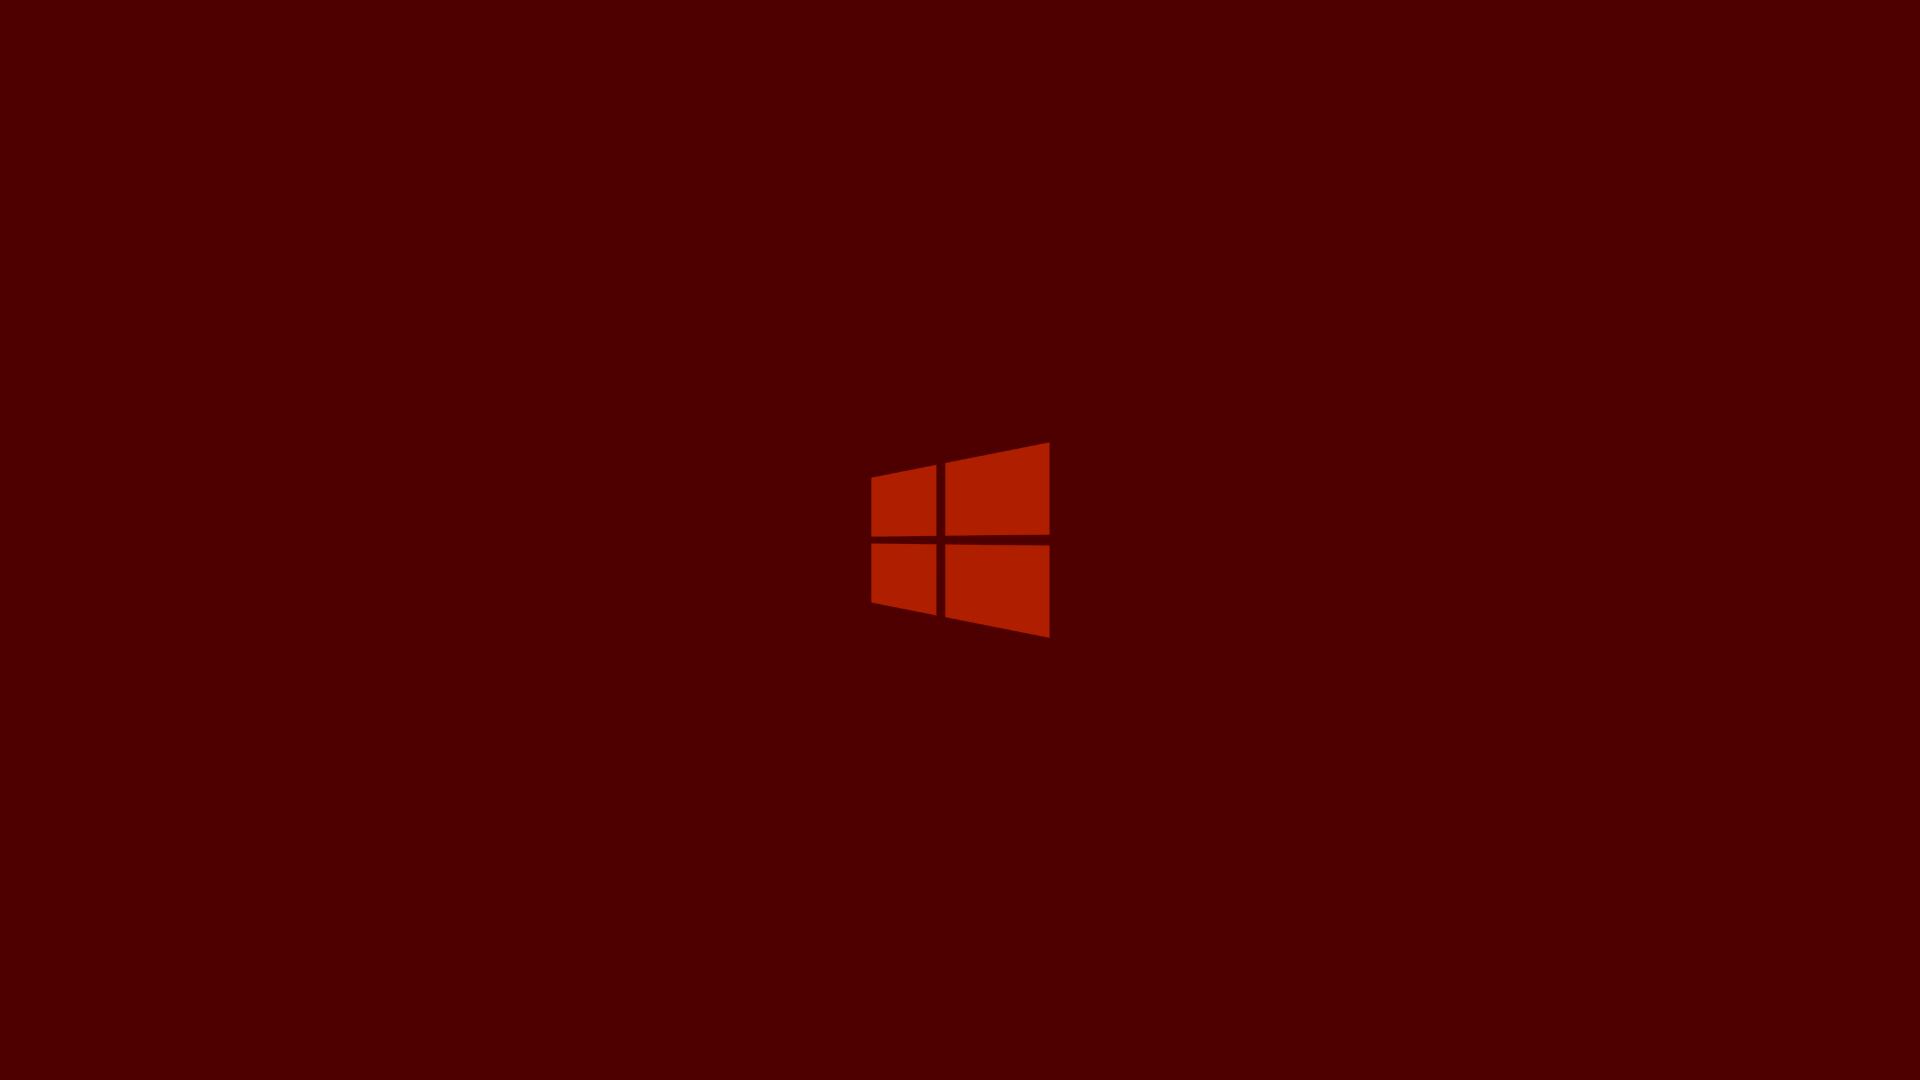 windows red wallpaper vista - photo #16